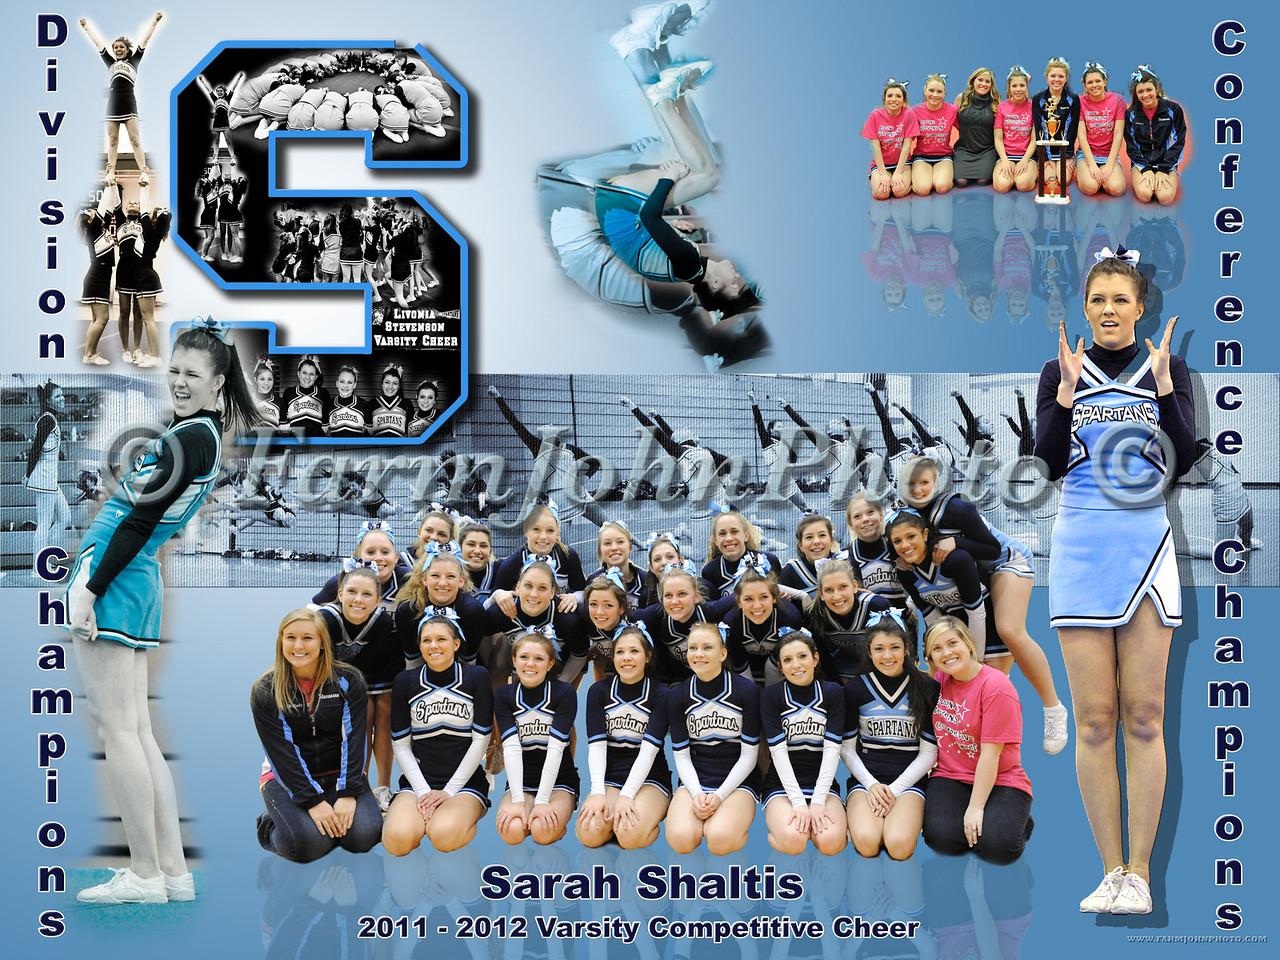 Sarah Shaltis 24 x 18 Format Proof 2